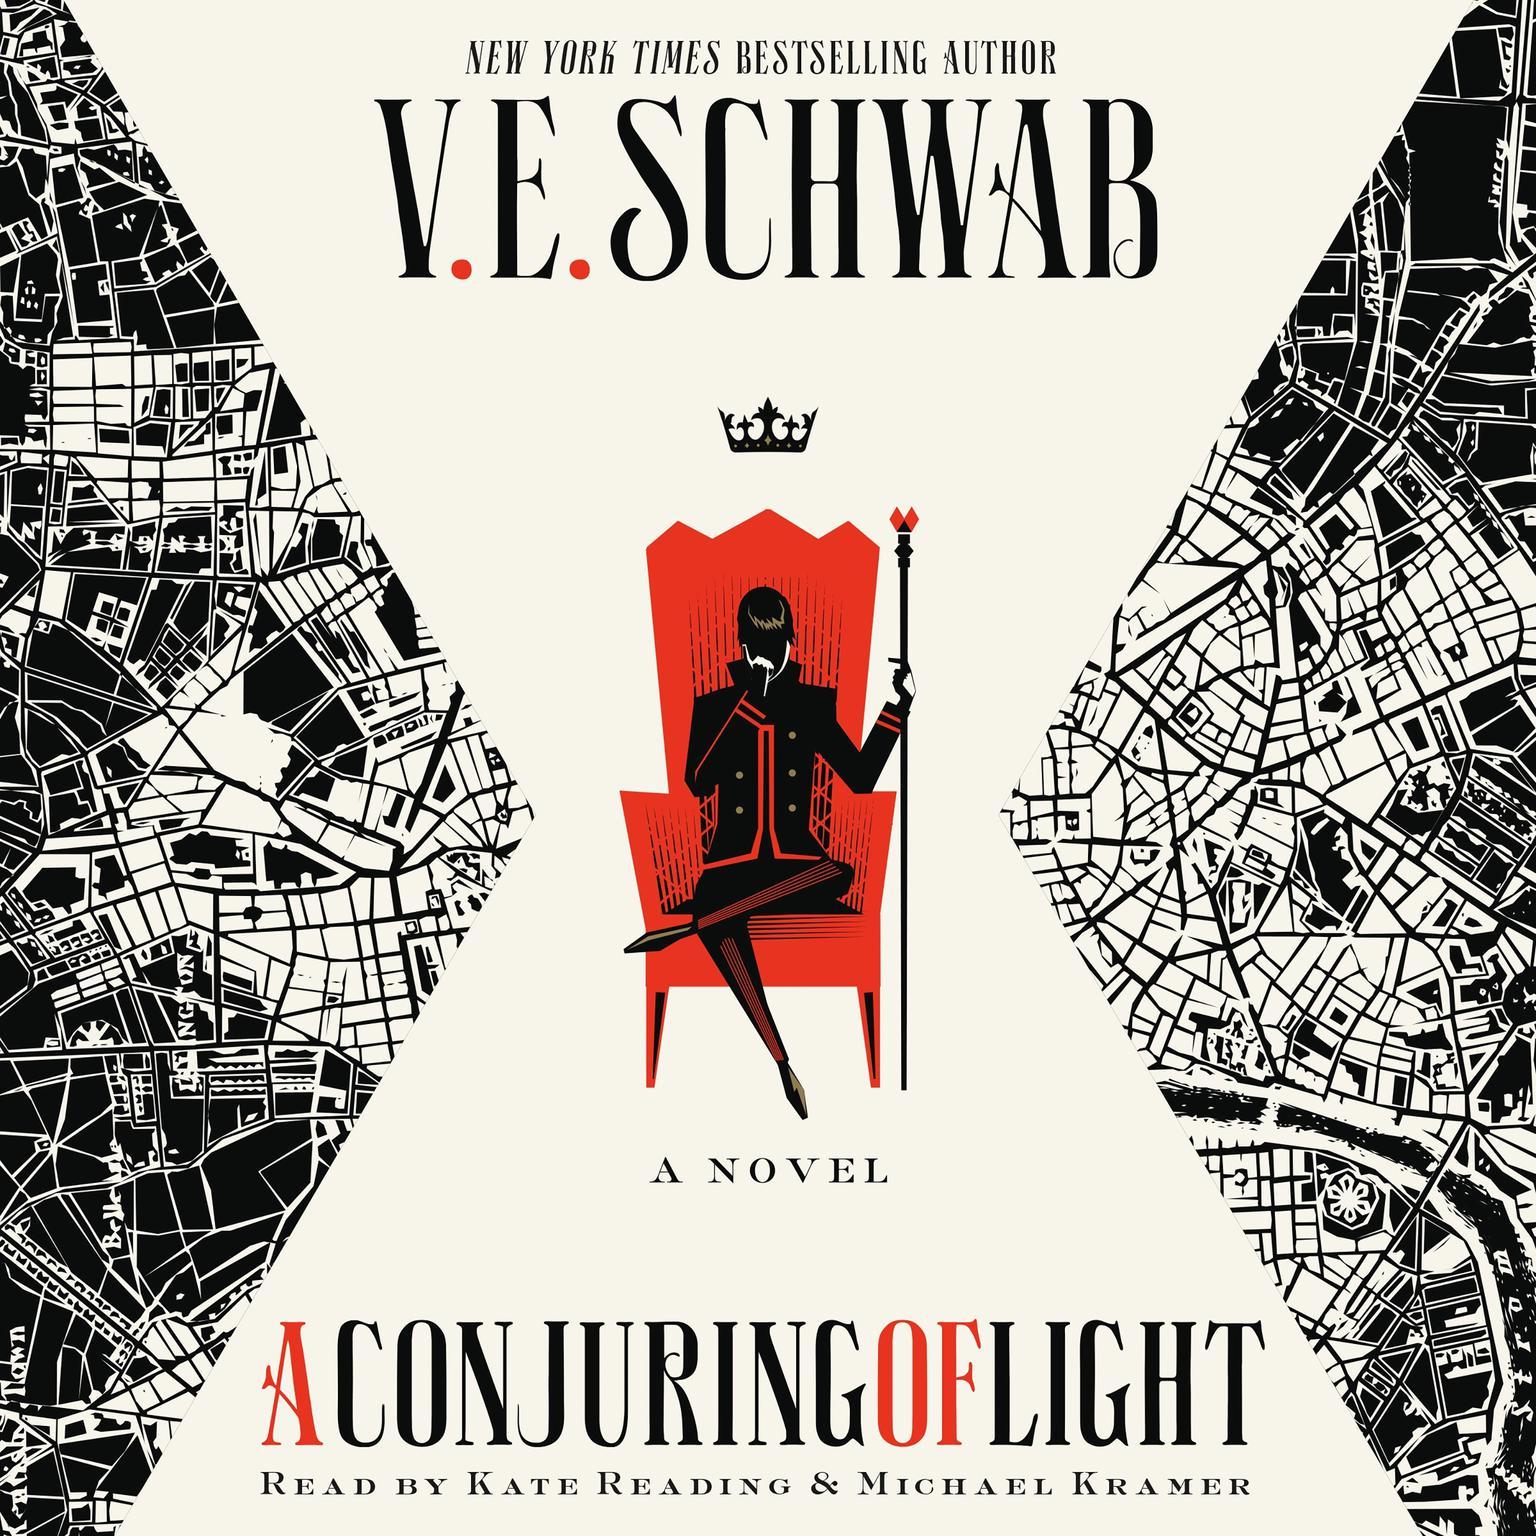 A Conjuring of Light: A Novel Audiobook, by V. E. Schwab